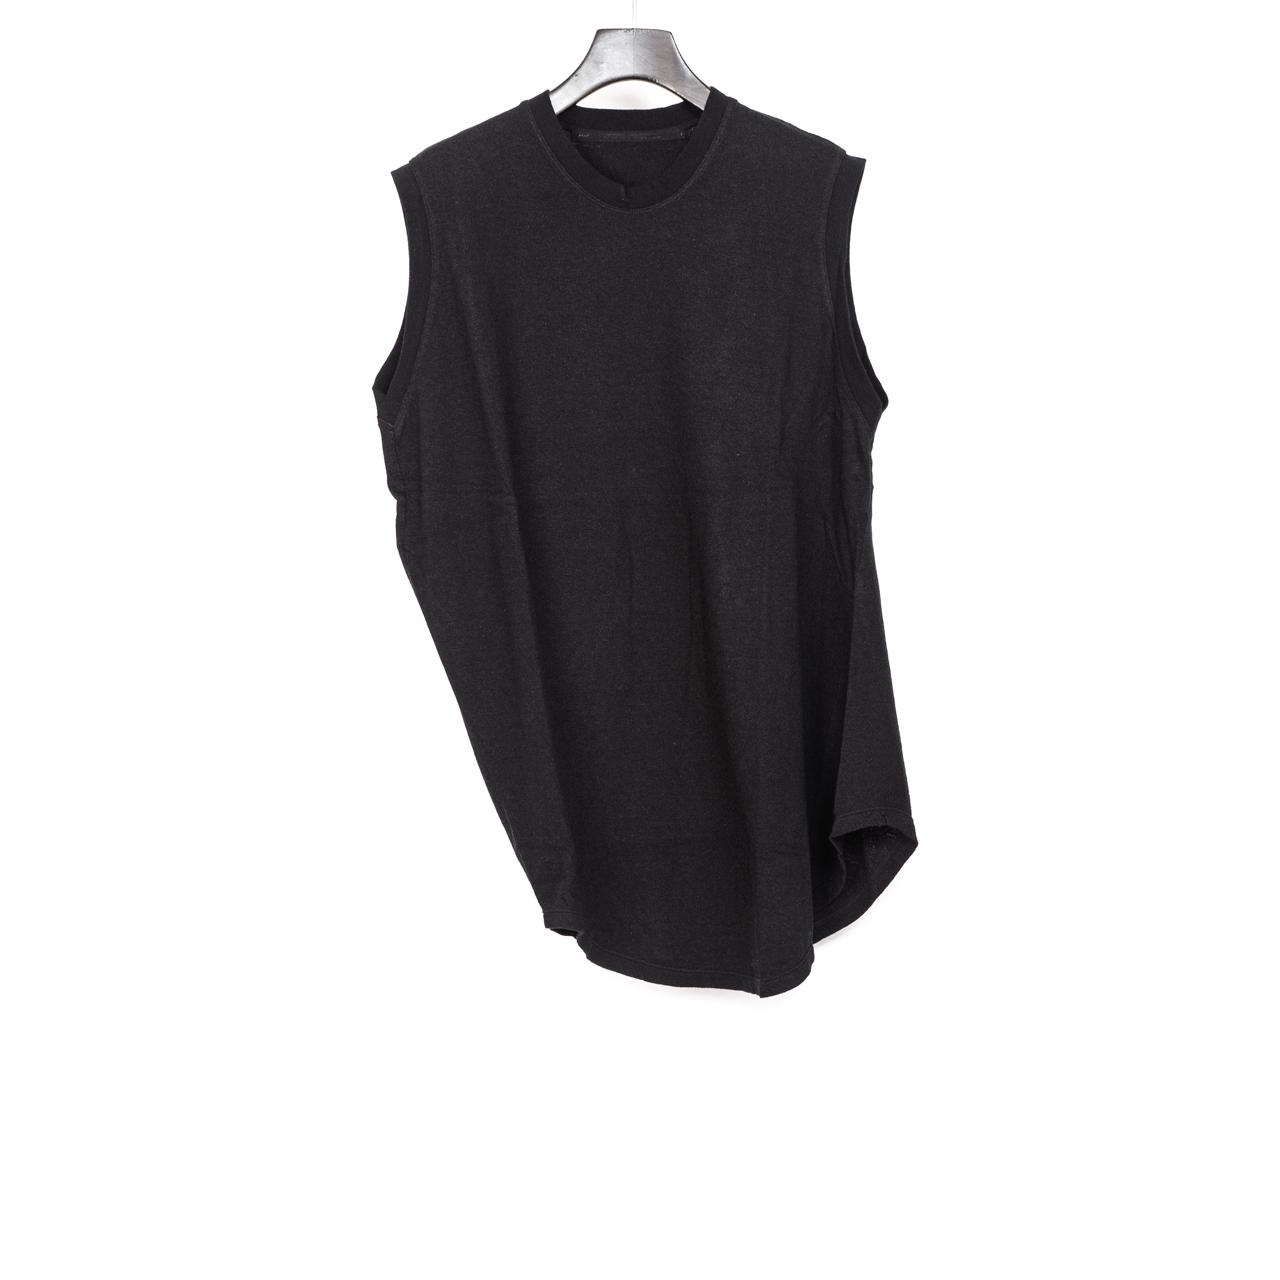 697CUM11-BLACK / サイドドレープノースリーブシャツ